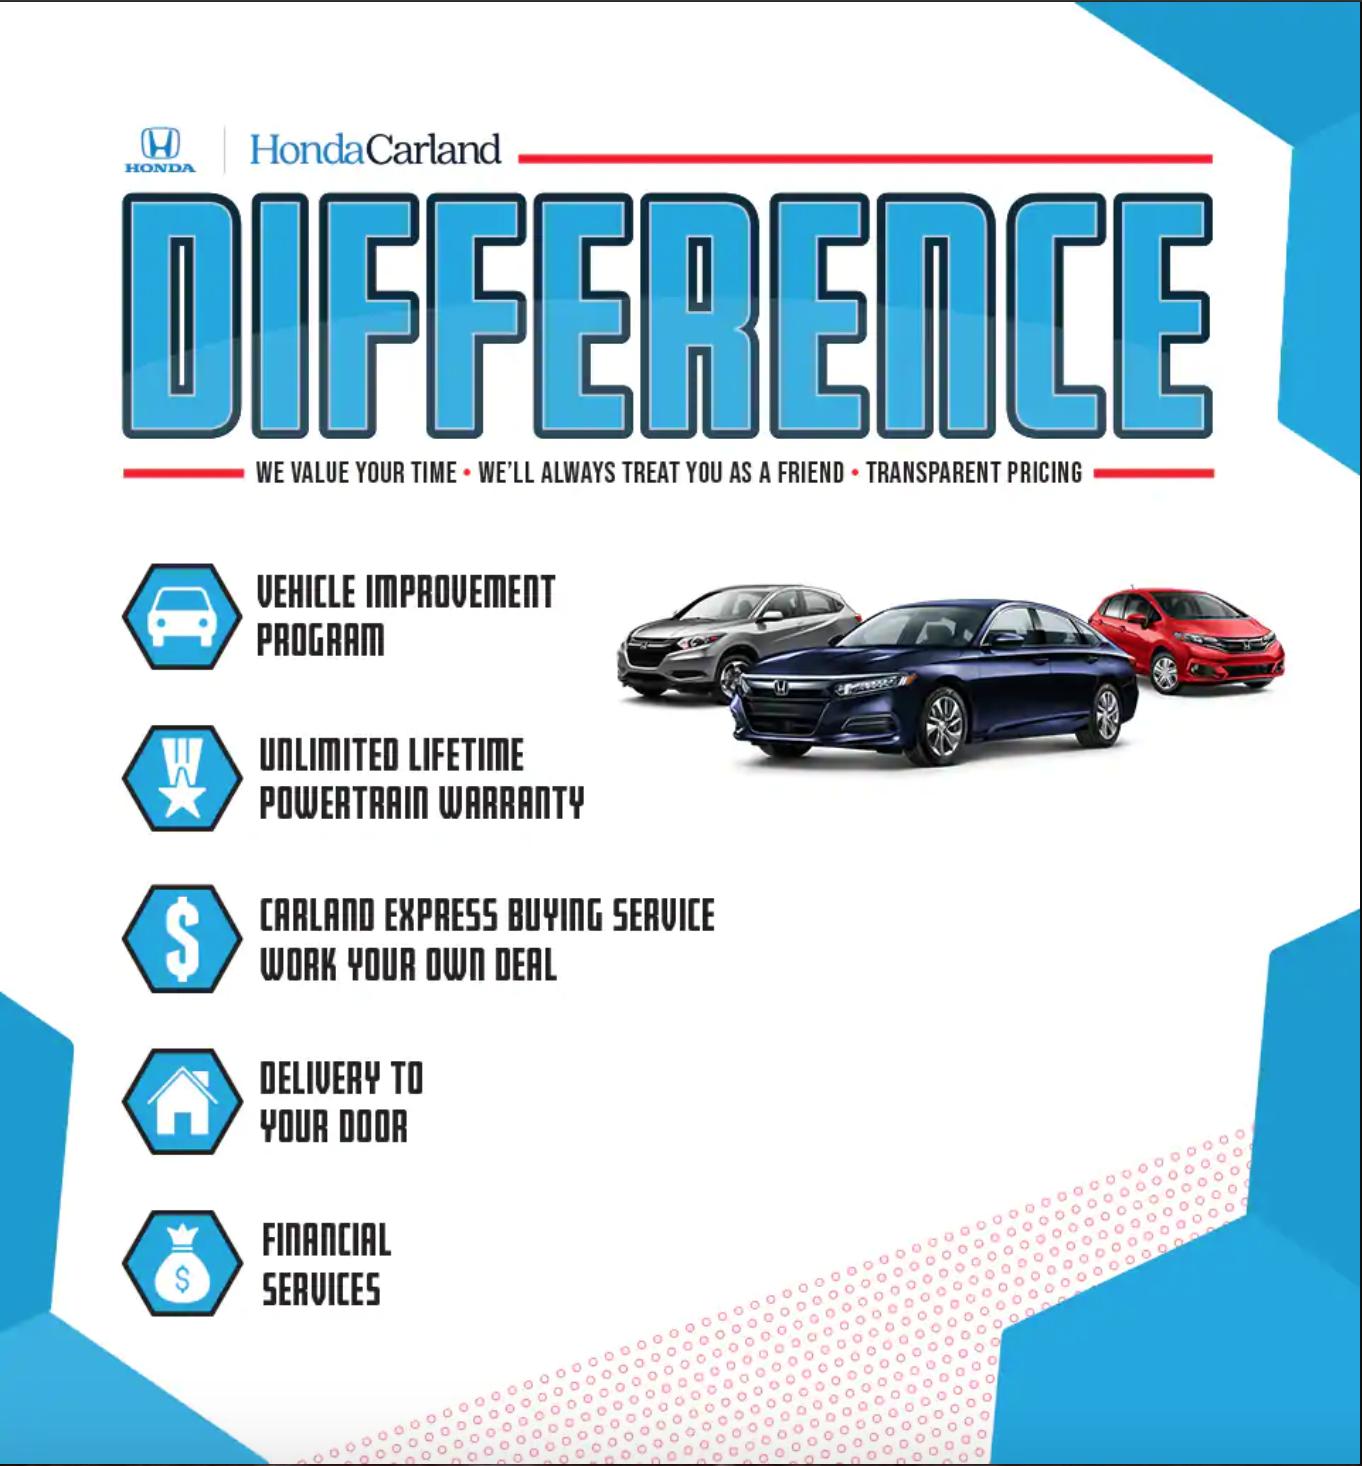 Honda Carland Service >> The Honda Carland Difference In Roswell Ga Honda Carland